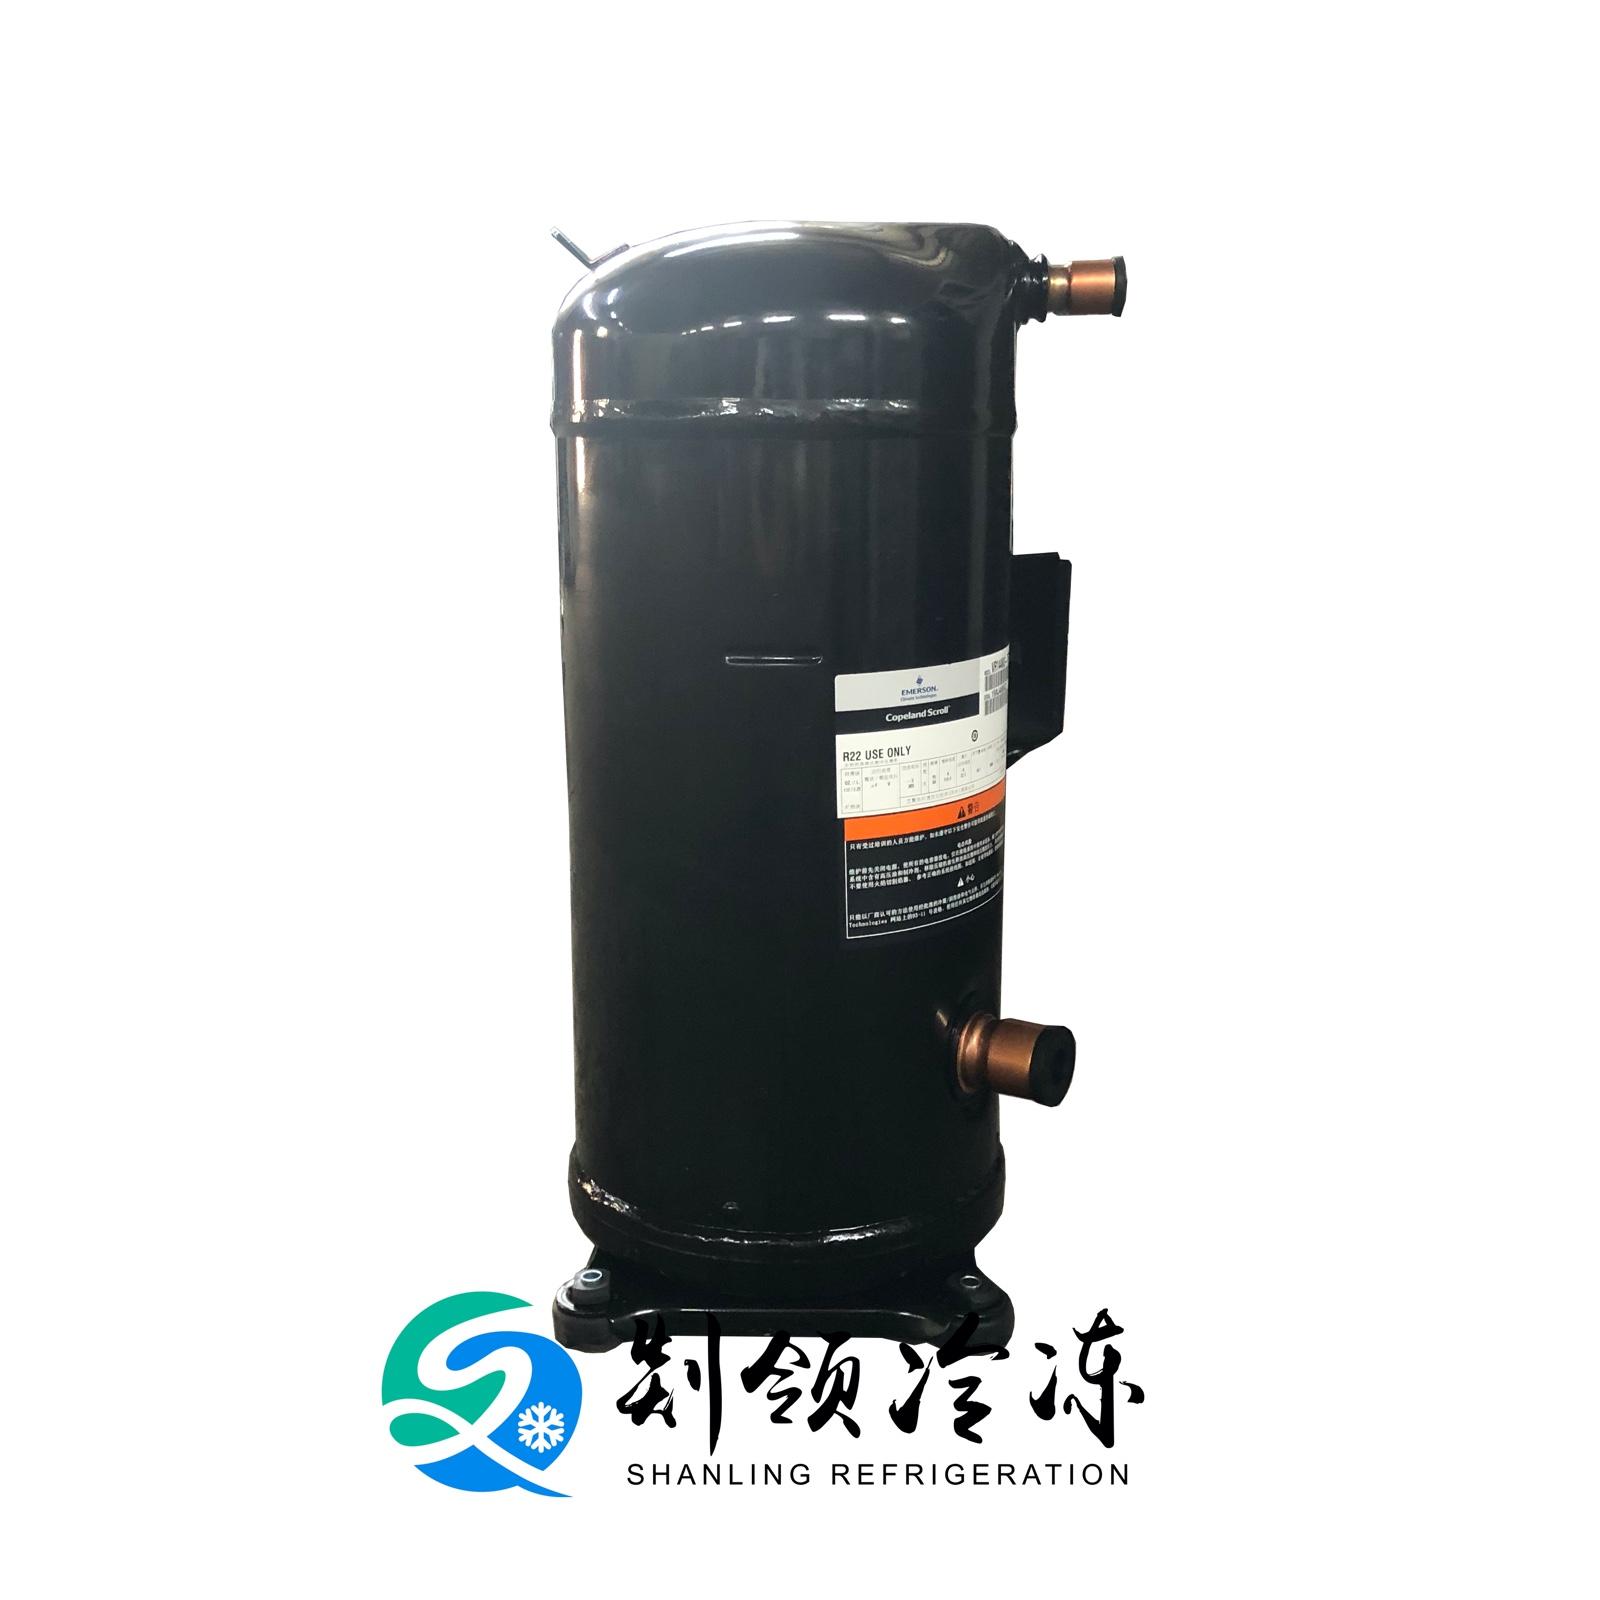 VR94KS-TFP-522制冷压缩机 Copeland艾默生涡旋压缩机 ZR/VR压机